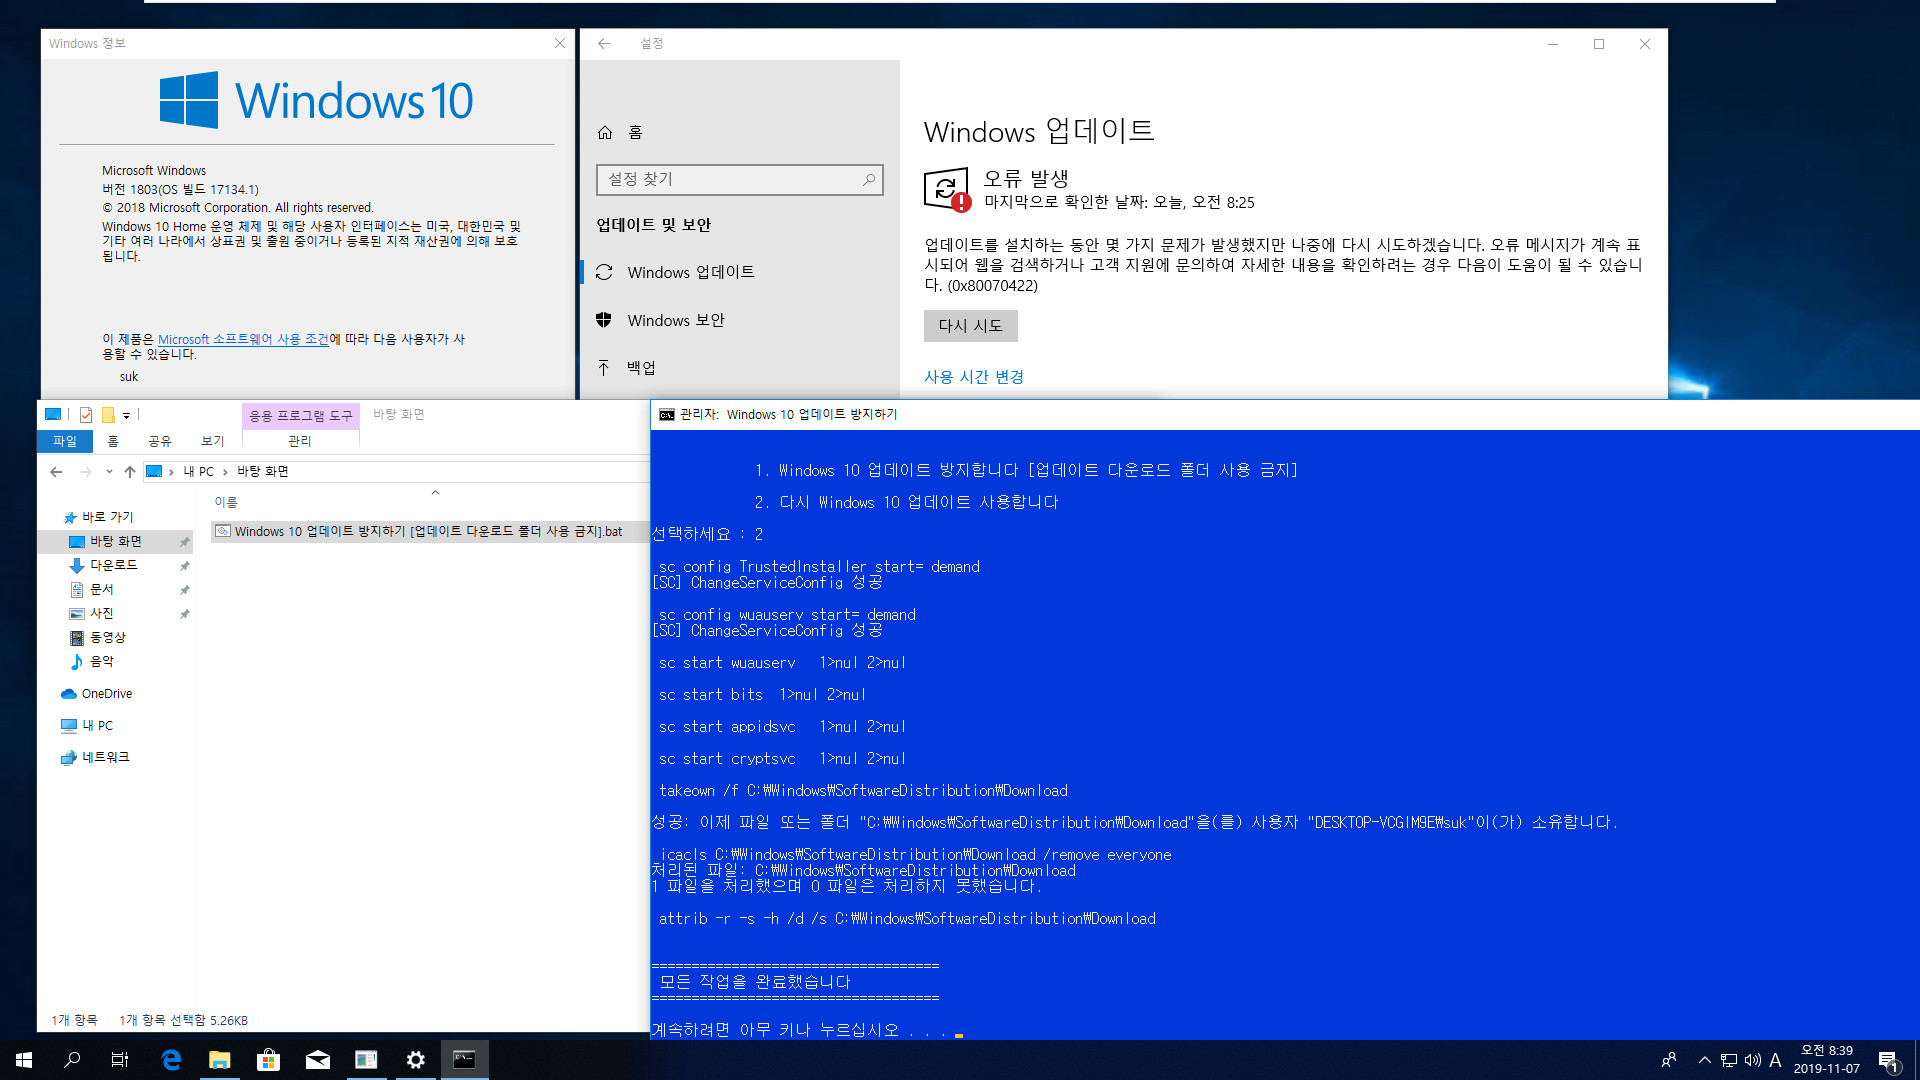 Windows 10 업데이트 방지하기 [업데이트 다운로드 폴더 사용 금지].bat 테스트 - 버전 1803, Home 에서 버전 1903 기능 업데이트 방지하기 2019-11-07_083923.jpg